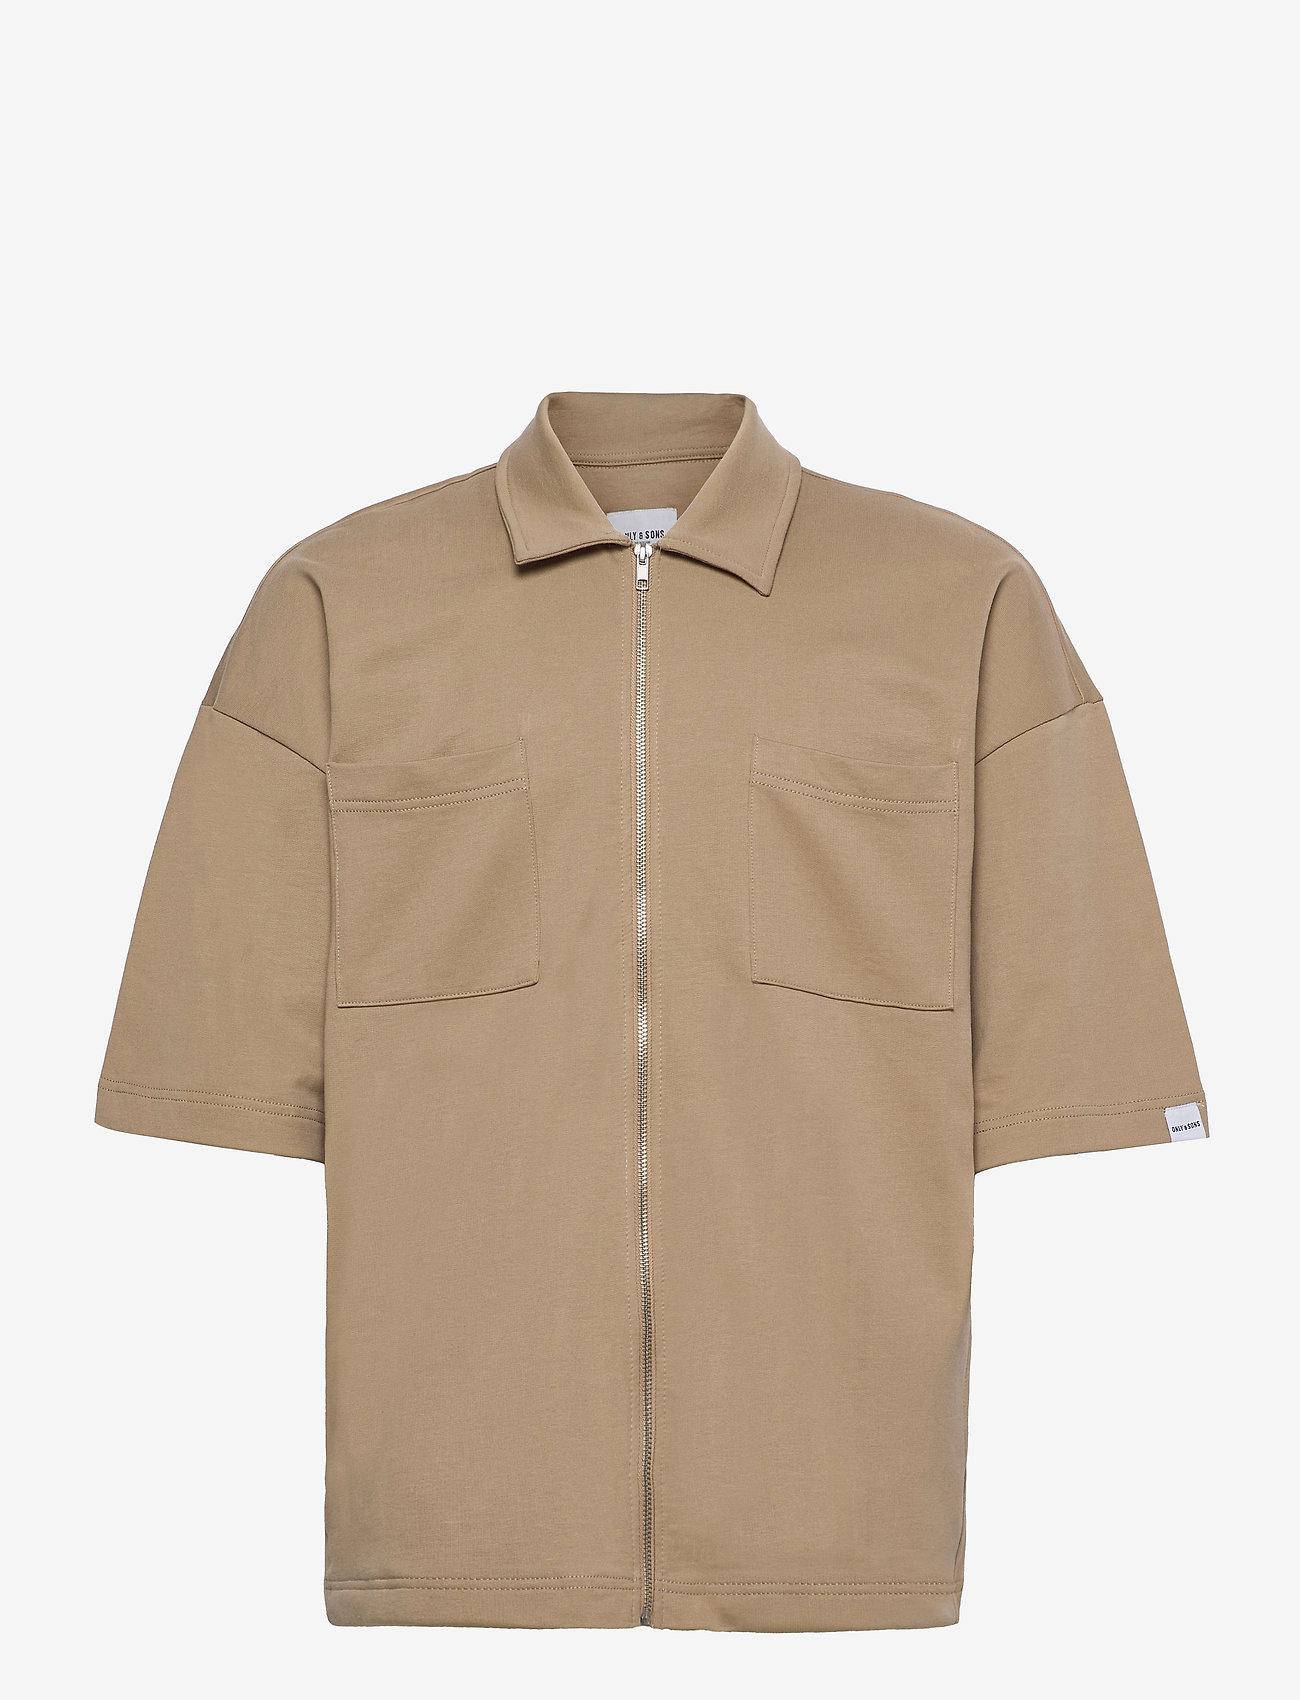 ONLY & SONS - ONSLEE  OVZ UTILITY ZIP SS SWEAT - koszule lniane - chinchilla - 0